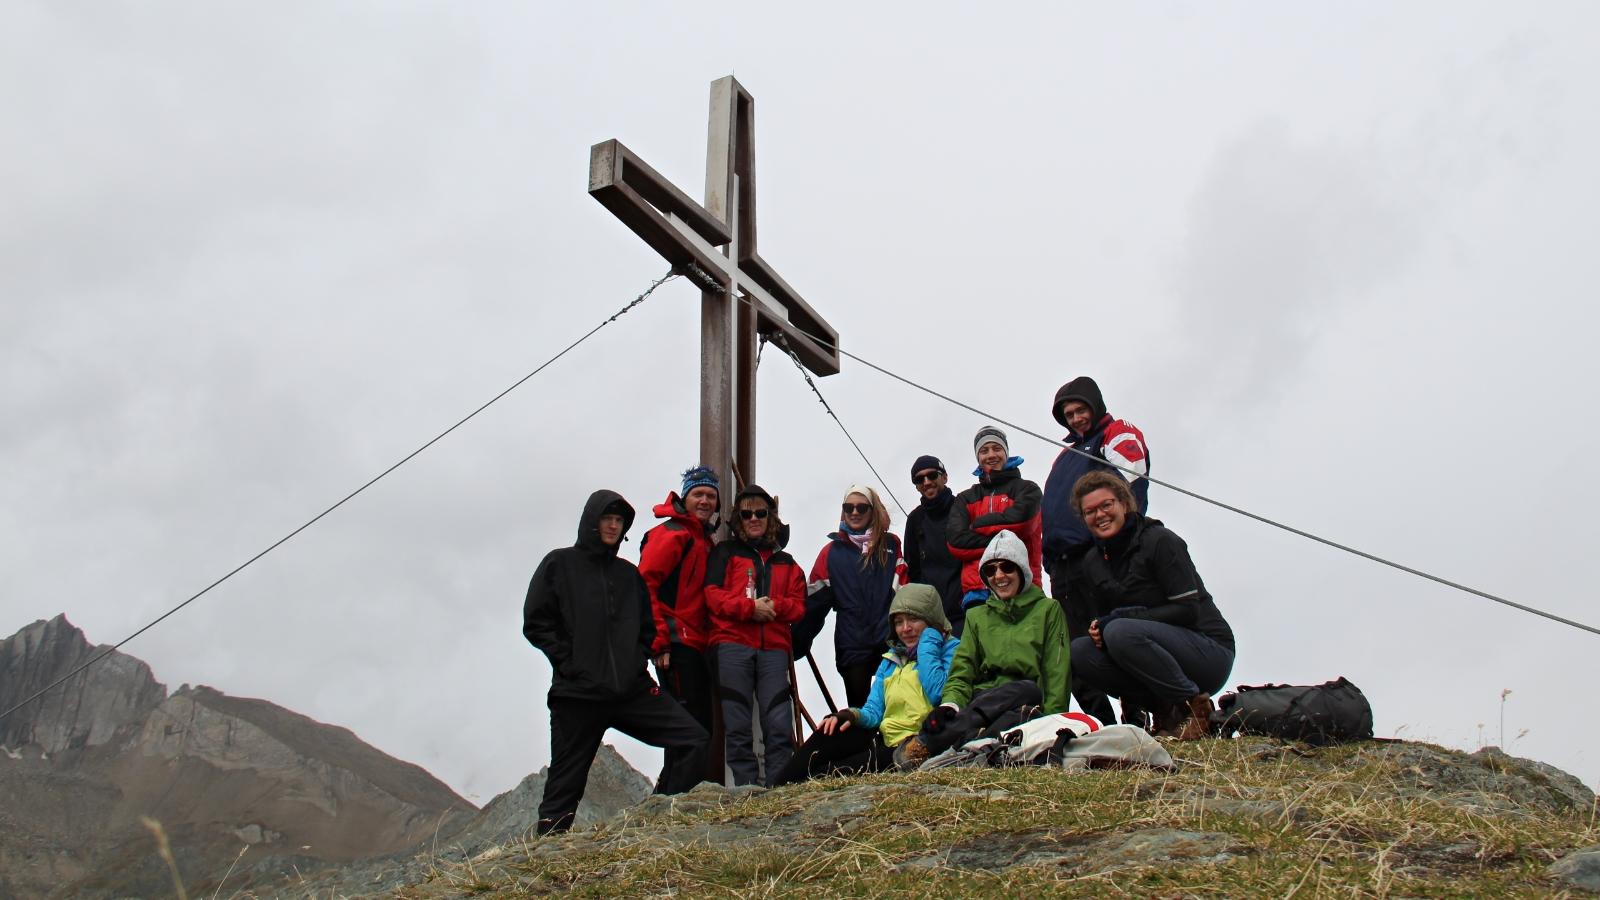 Gipfel Wiesbauerspitze